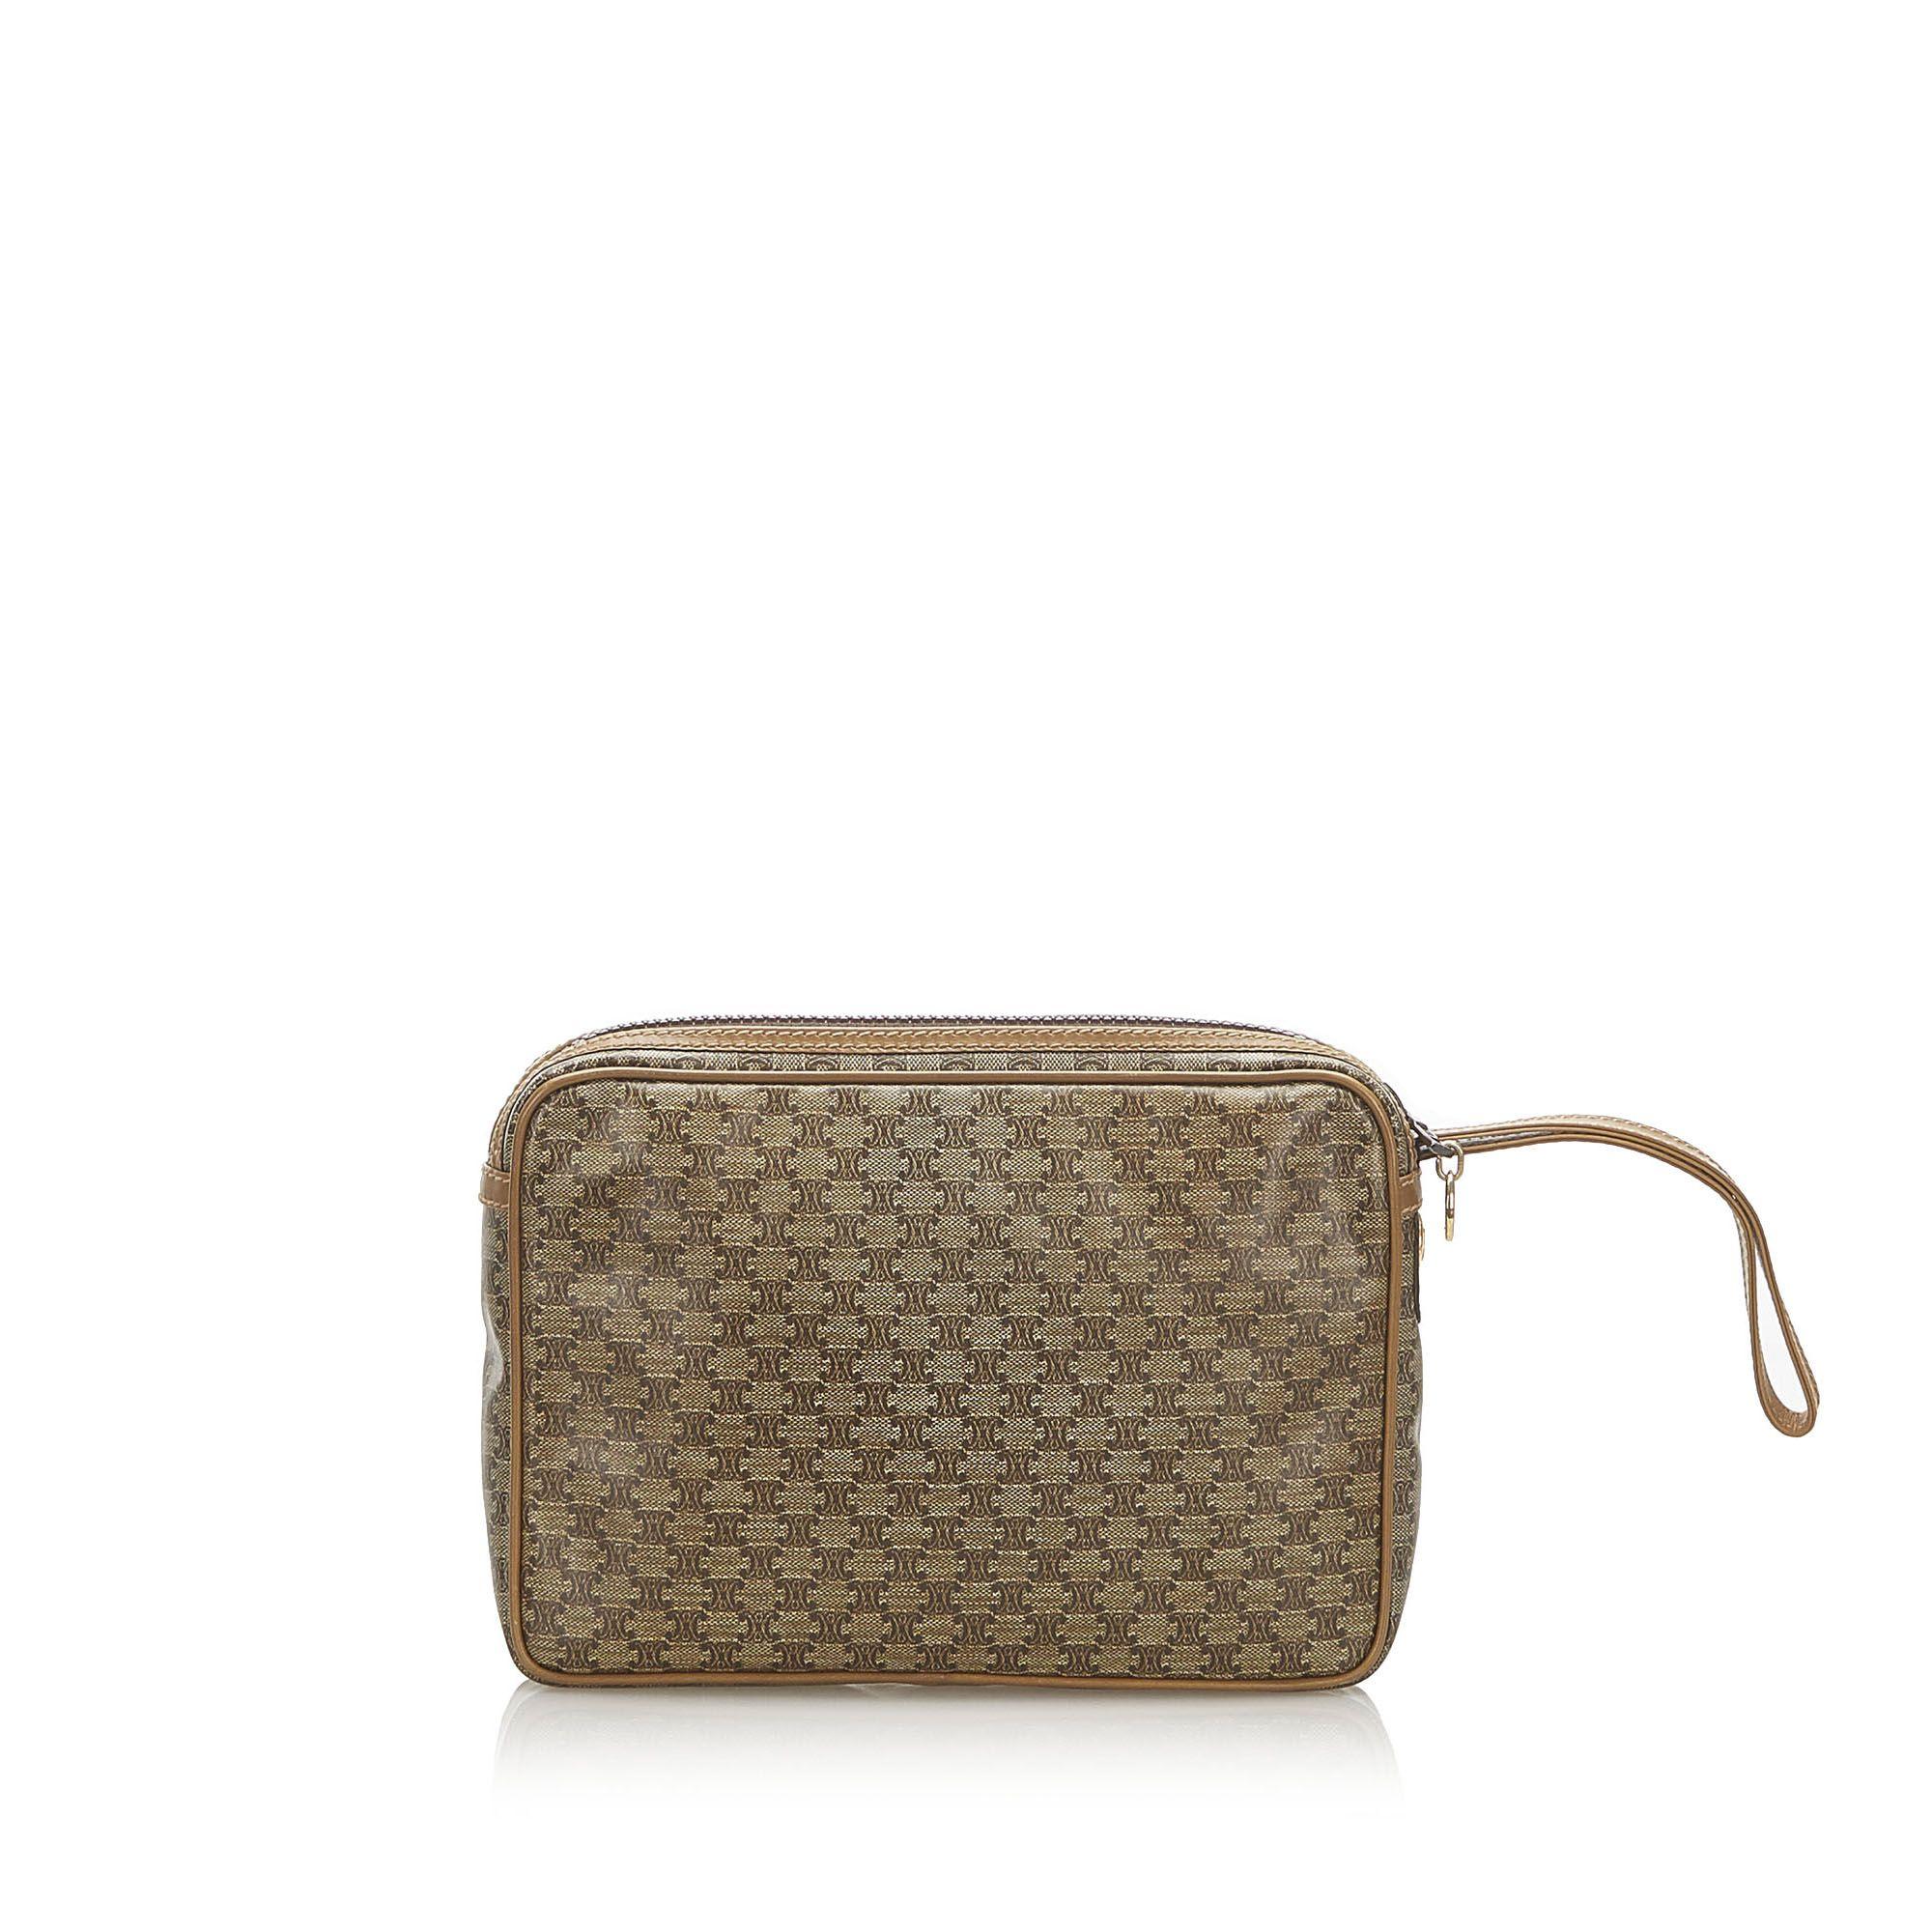 Vintage Celine Macadam Clutch Bag Brown